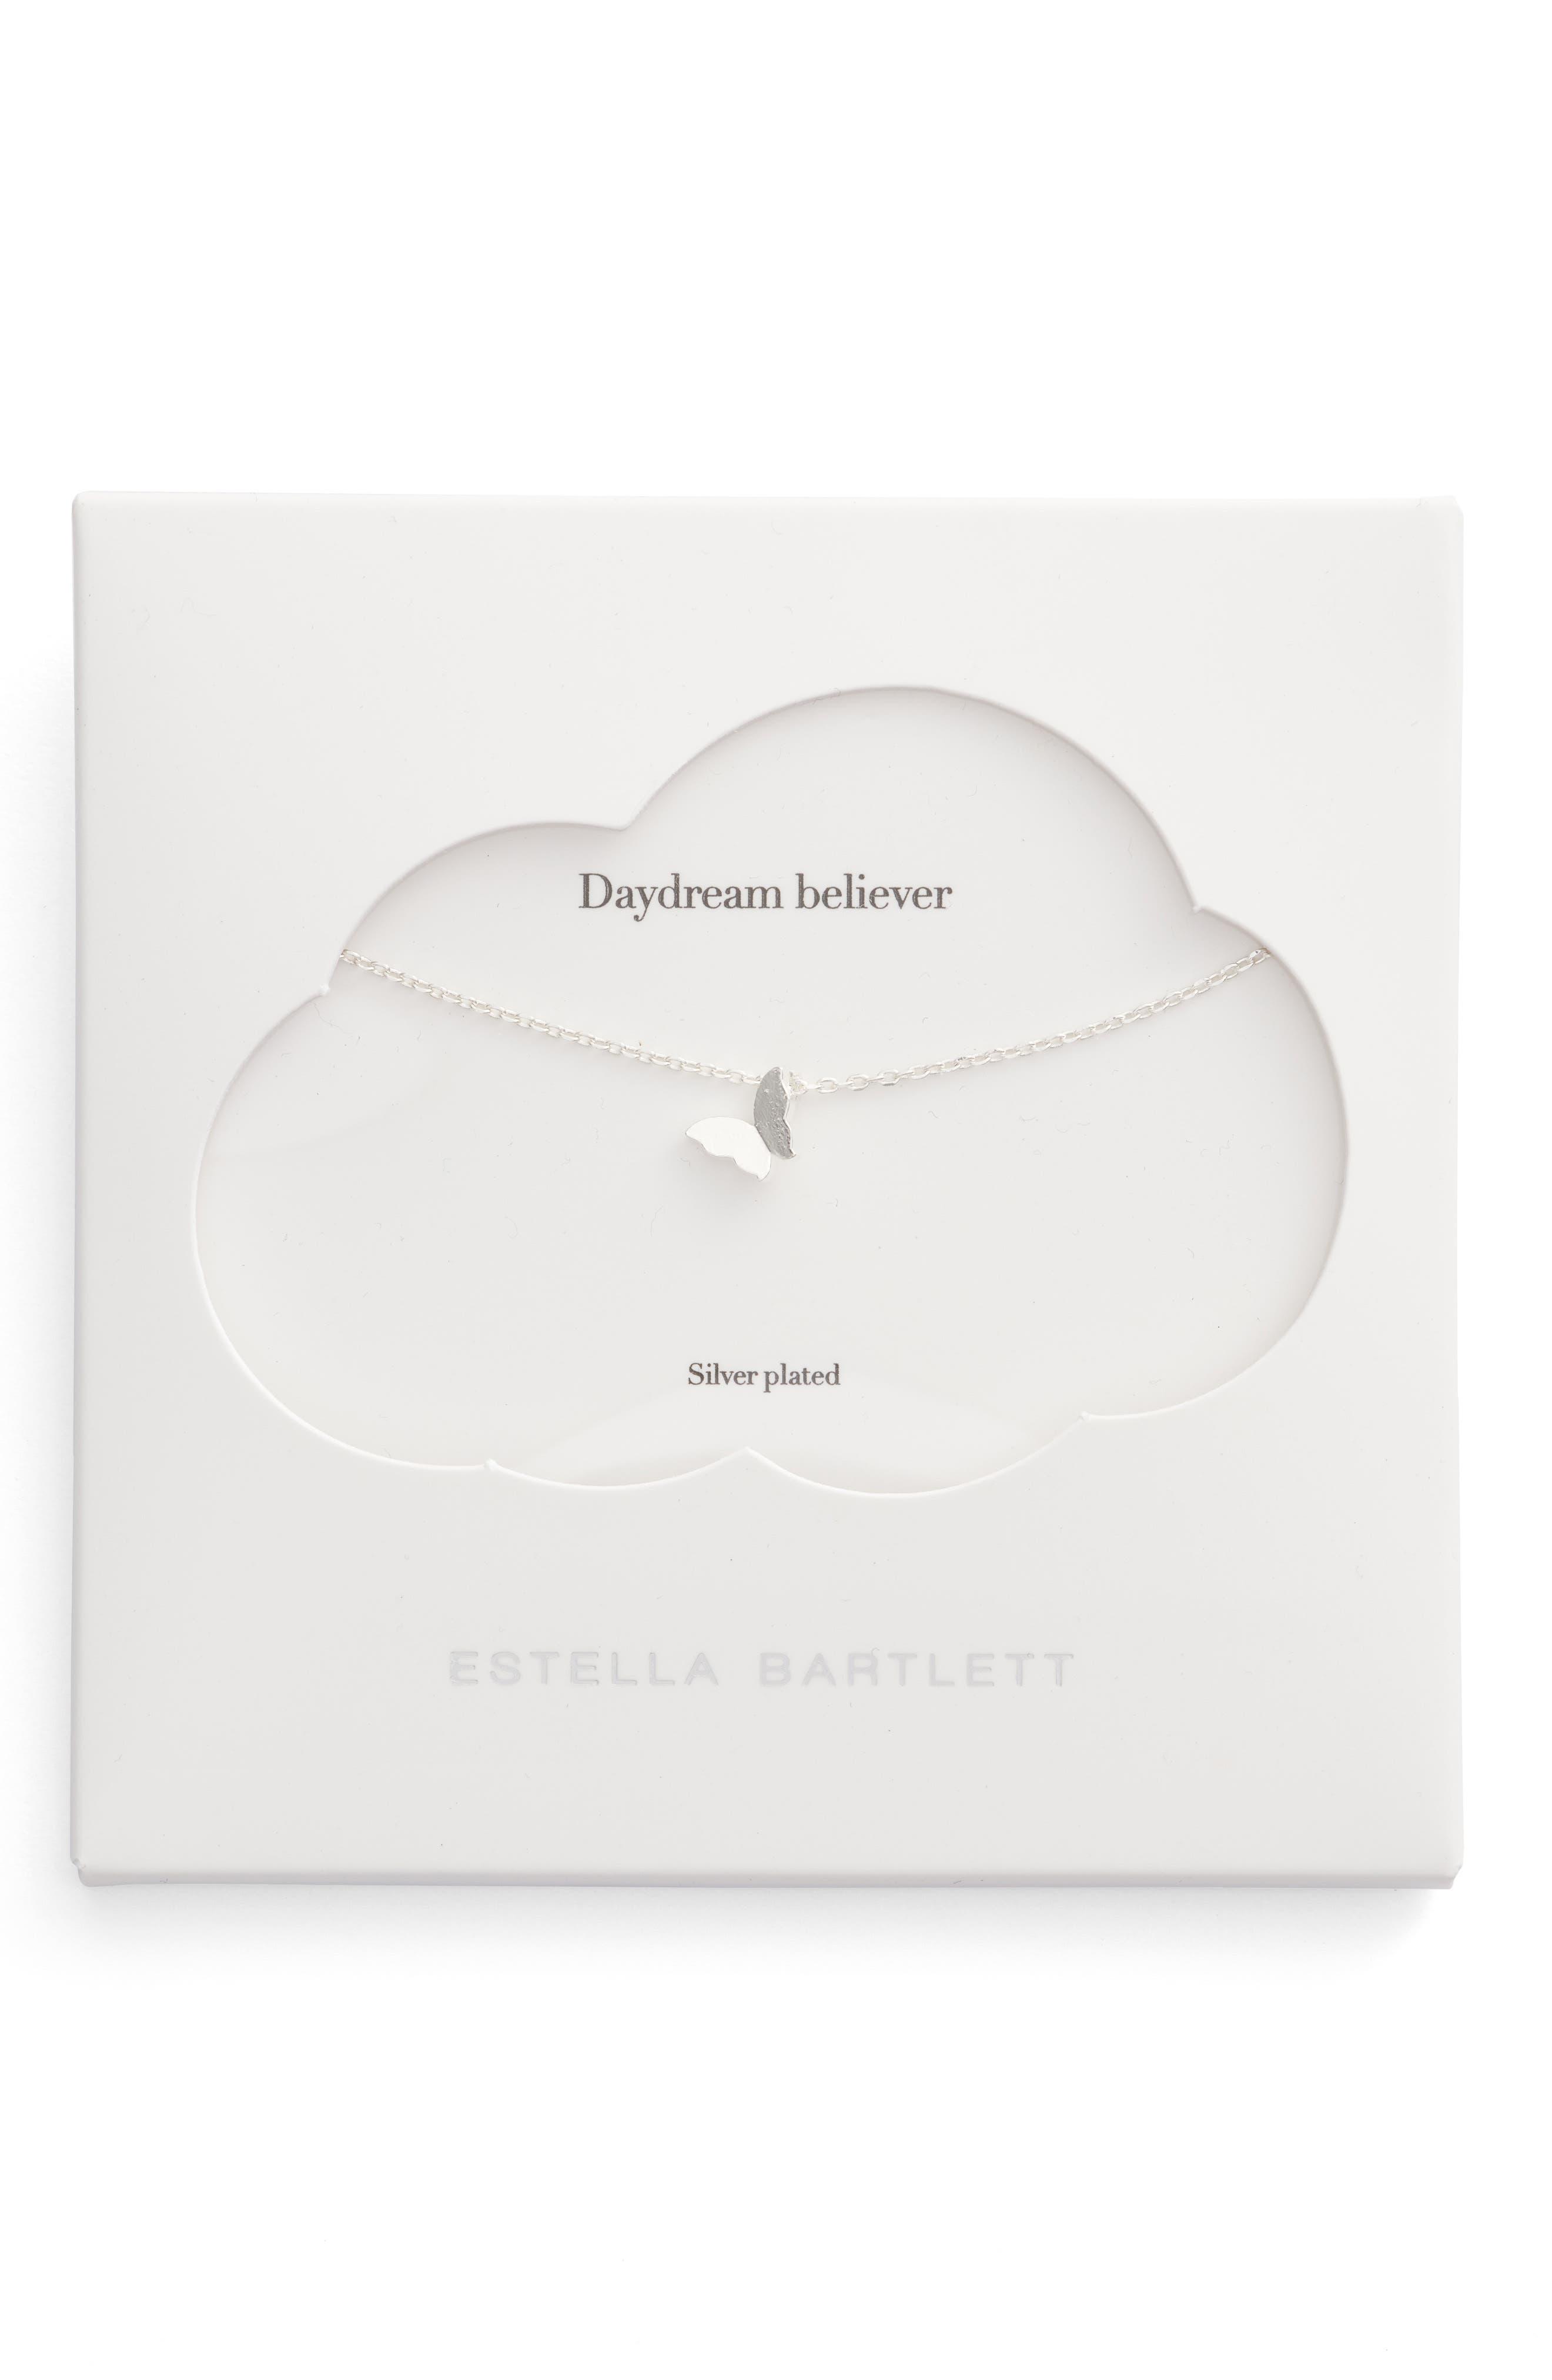 Alternate Image 1 Selected - Estella Bartlett Daydream Believers Butterfly Pendant Necklace